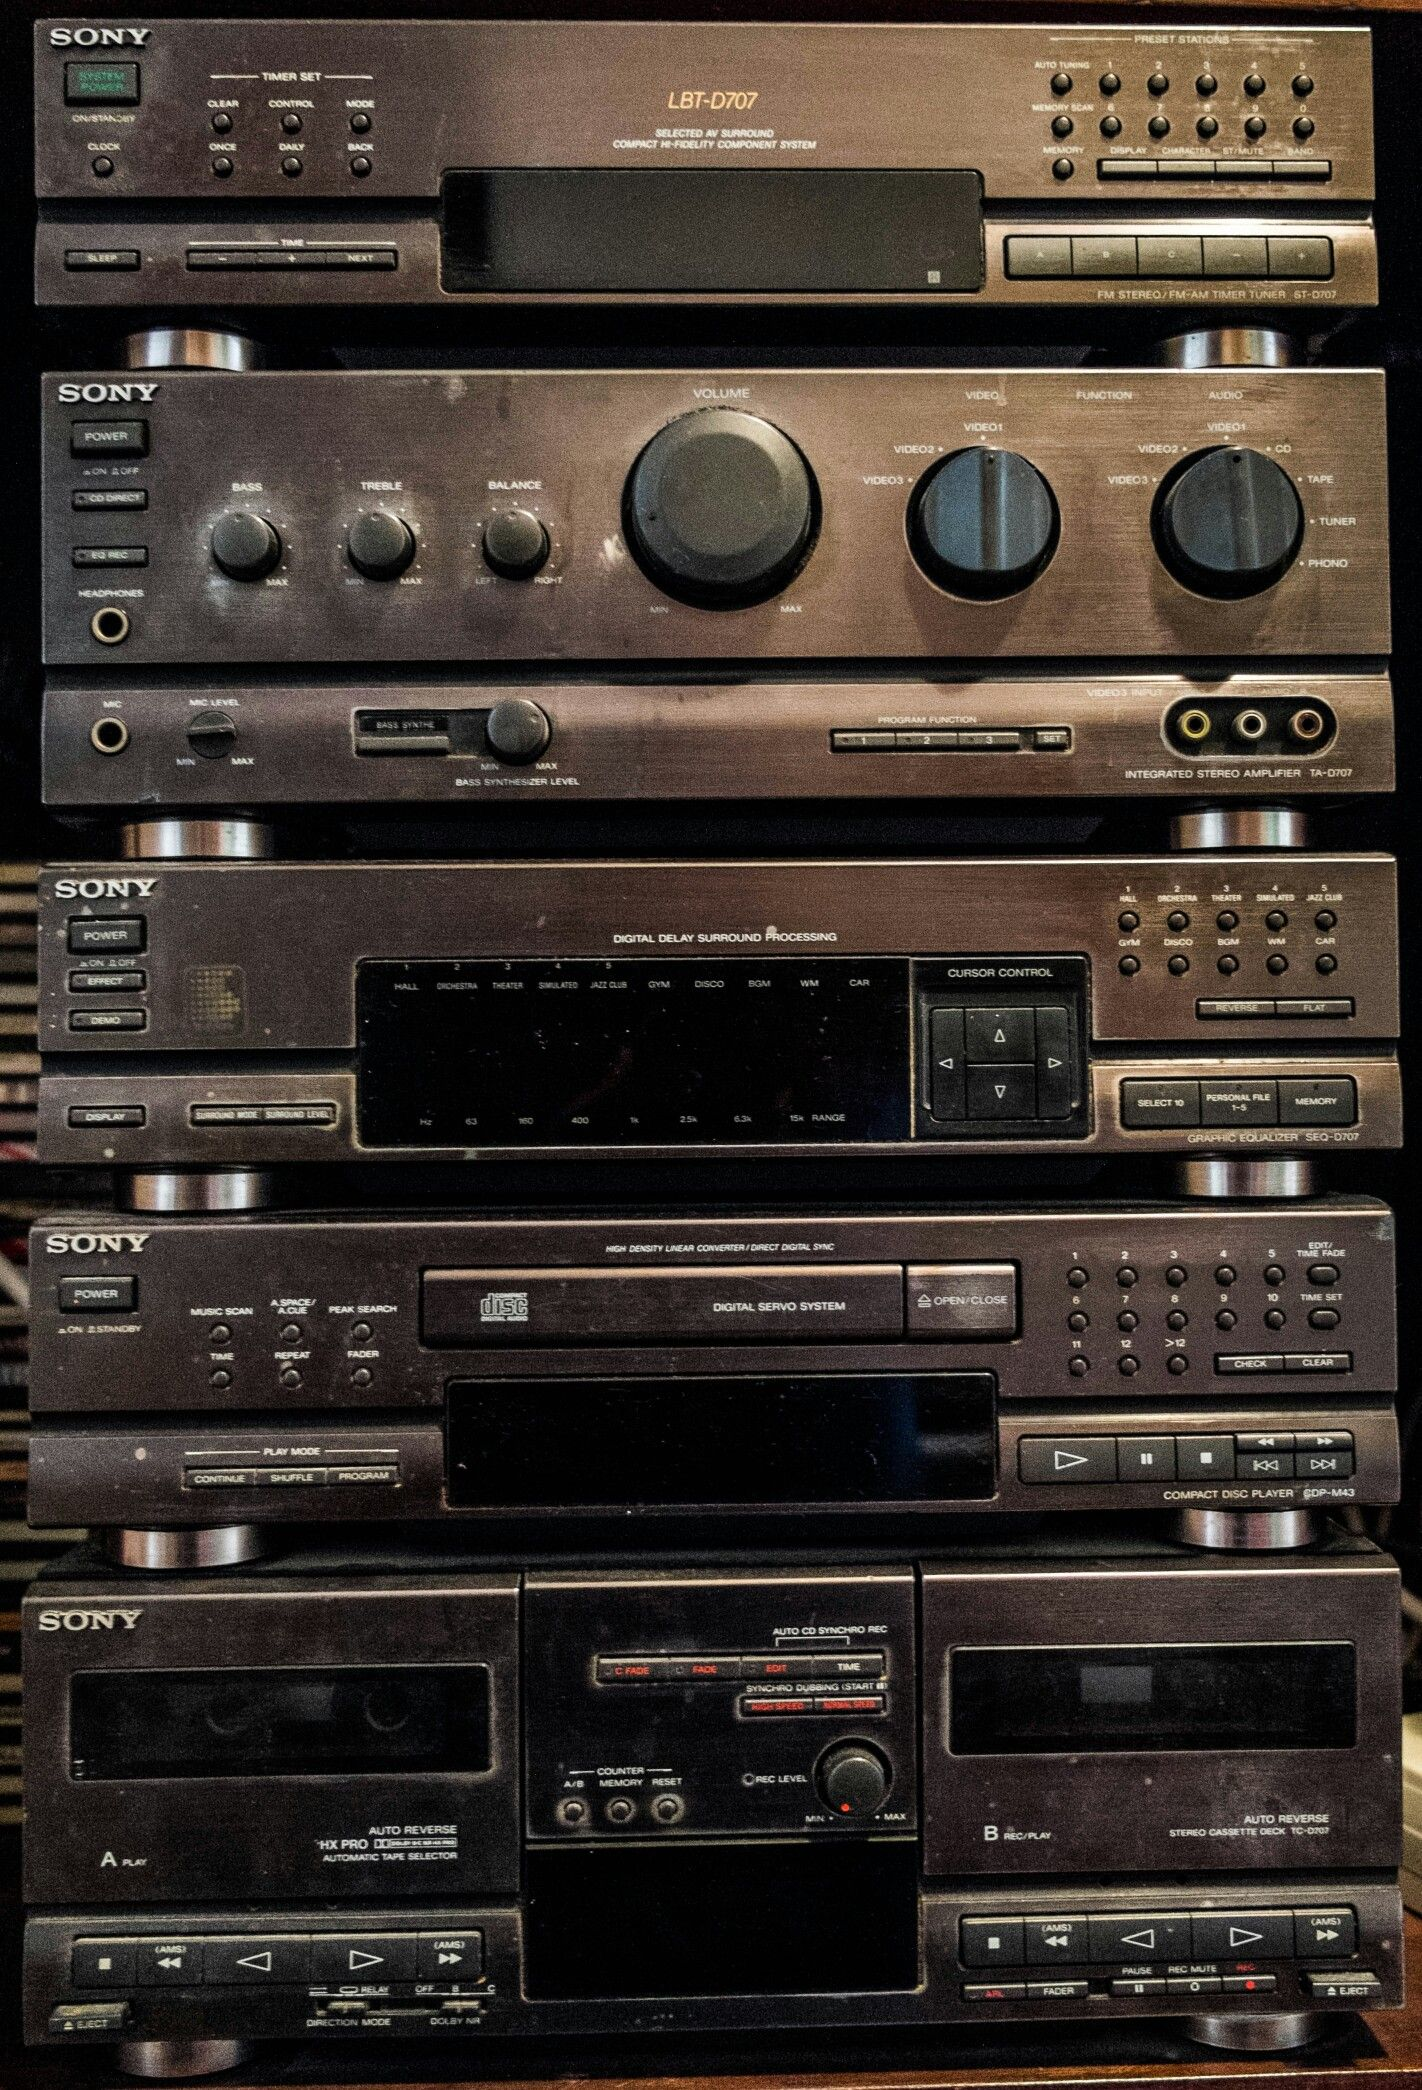 Sony Vintage Hifi Sony Lbt D707 Aparelho De Som Radio Antigo Retro